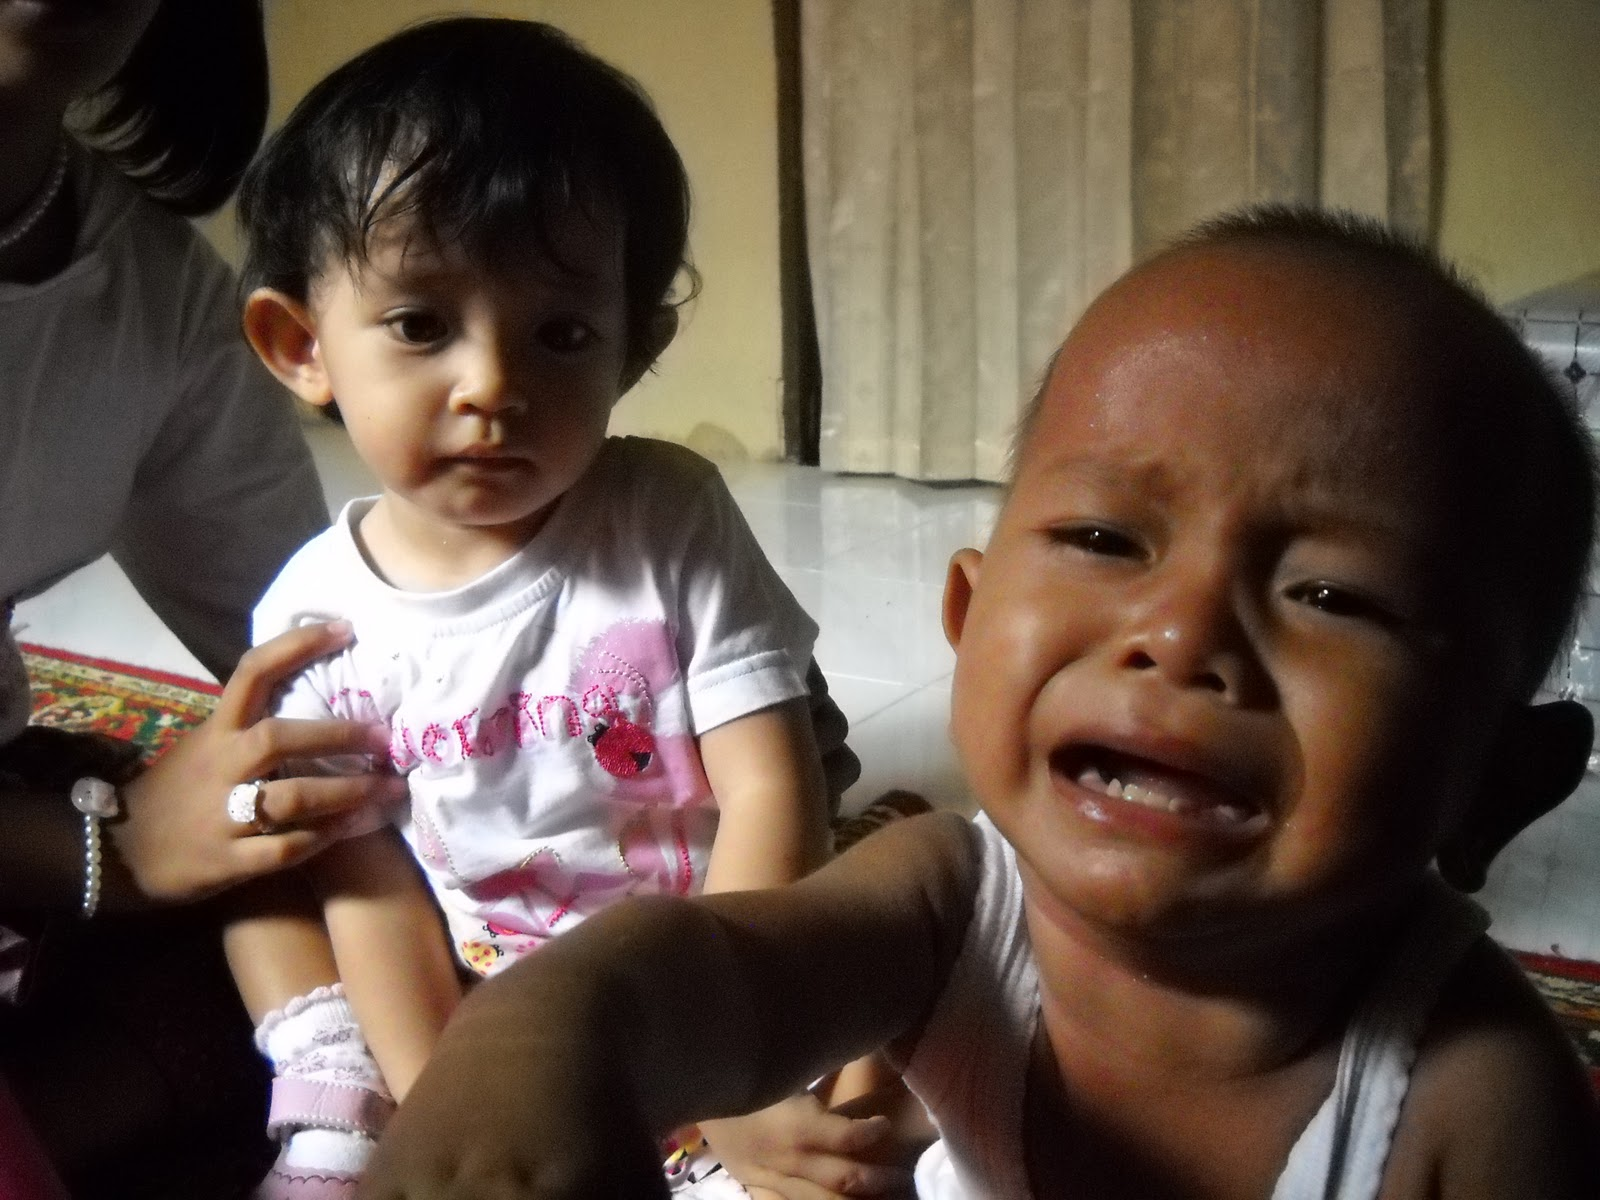 BULETIN HITAM Senyuman Tawa Dan Tangis Anak Kecil